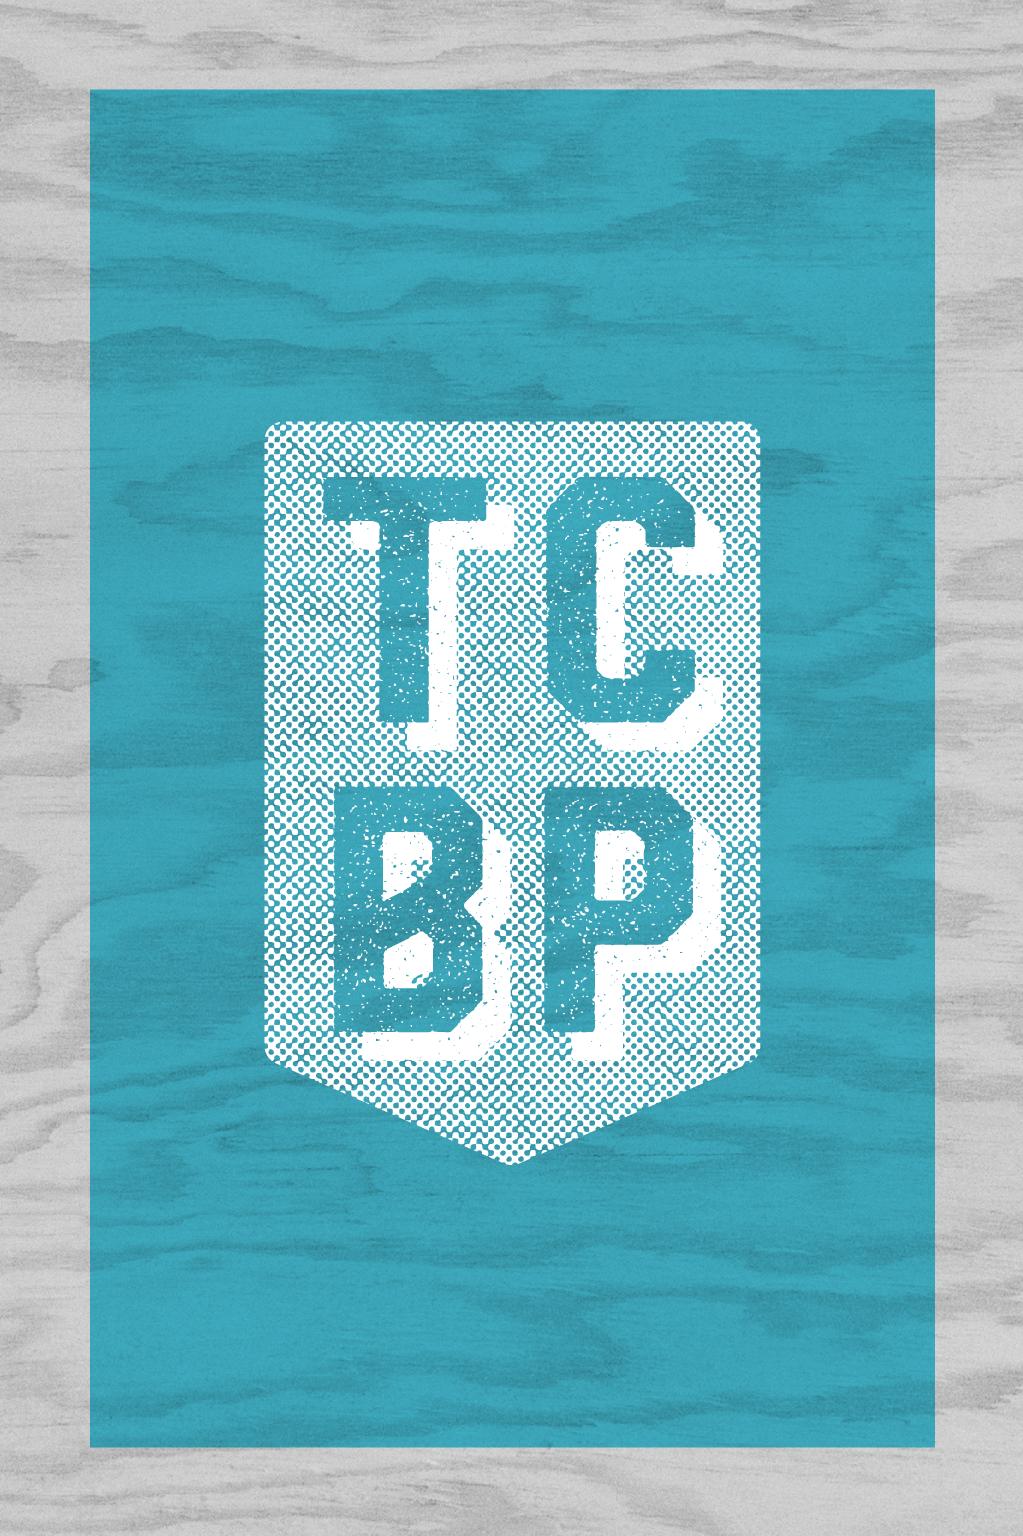 TCBP_Web_07.png